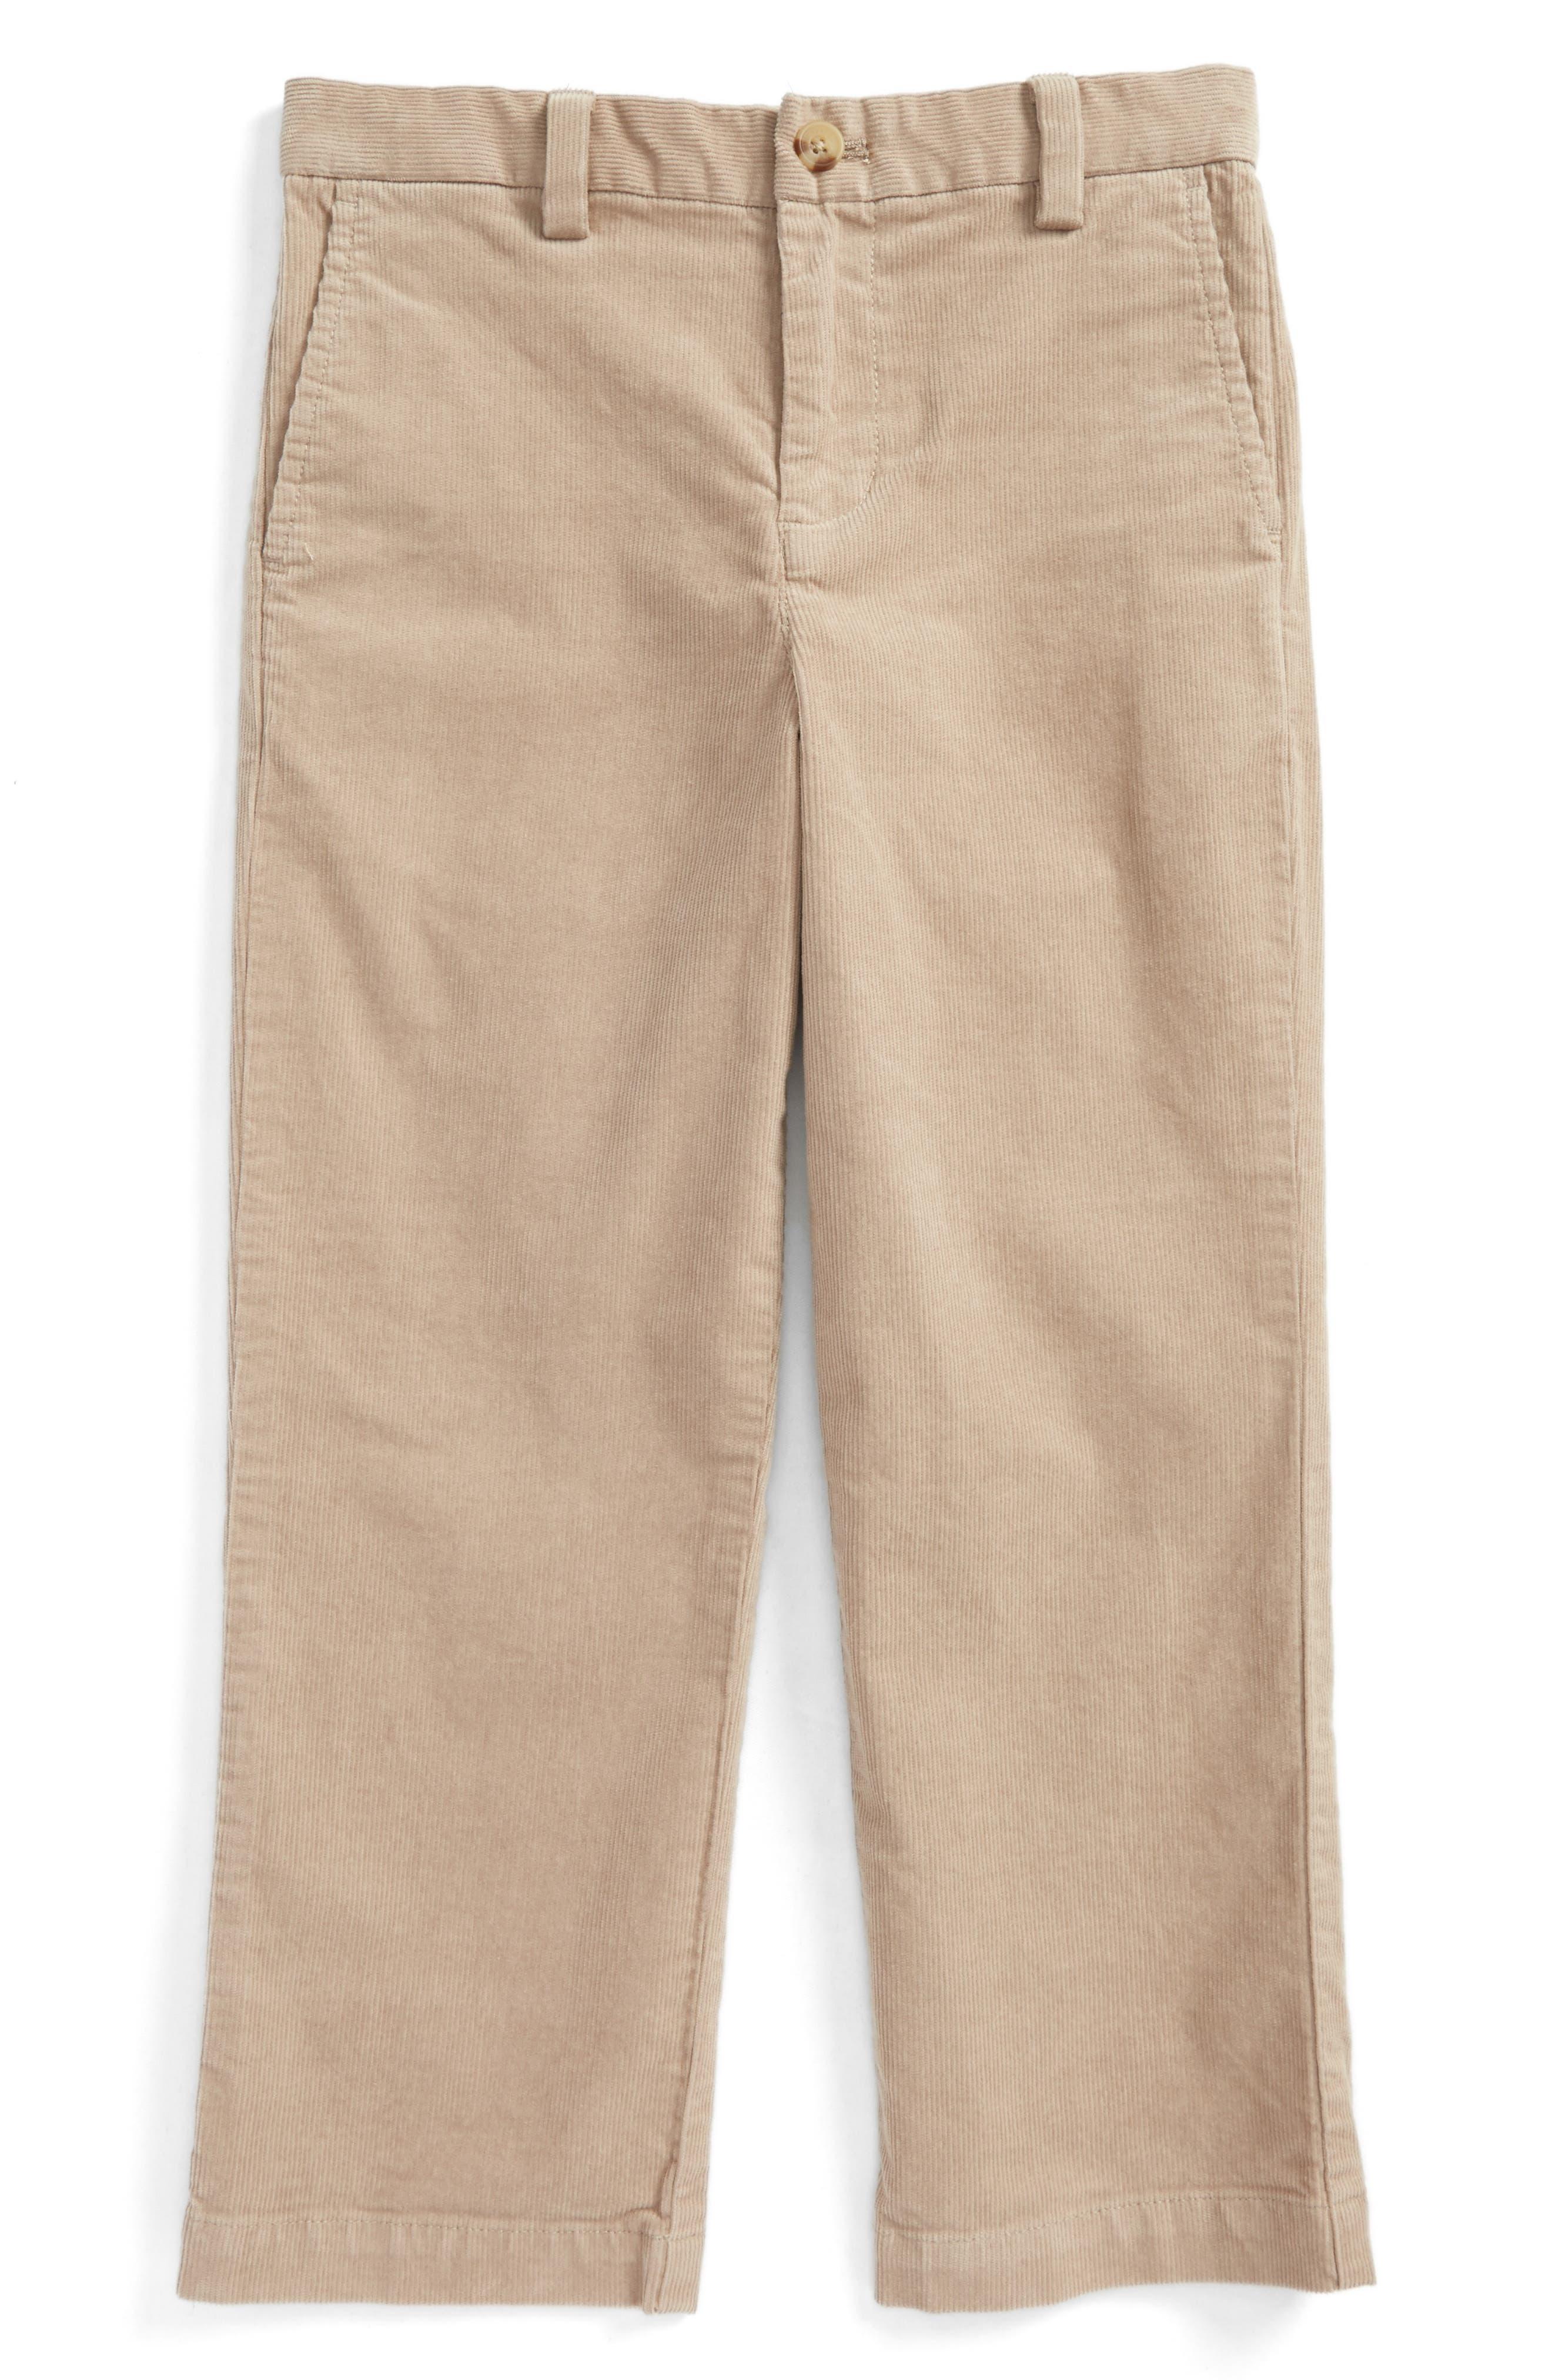 Breaker Corduroy Pants,                         Main,                         color, 250